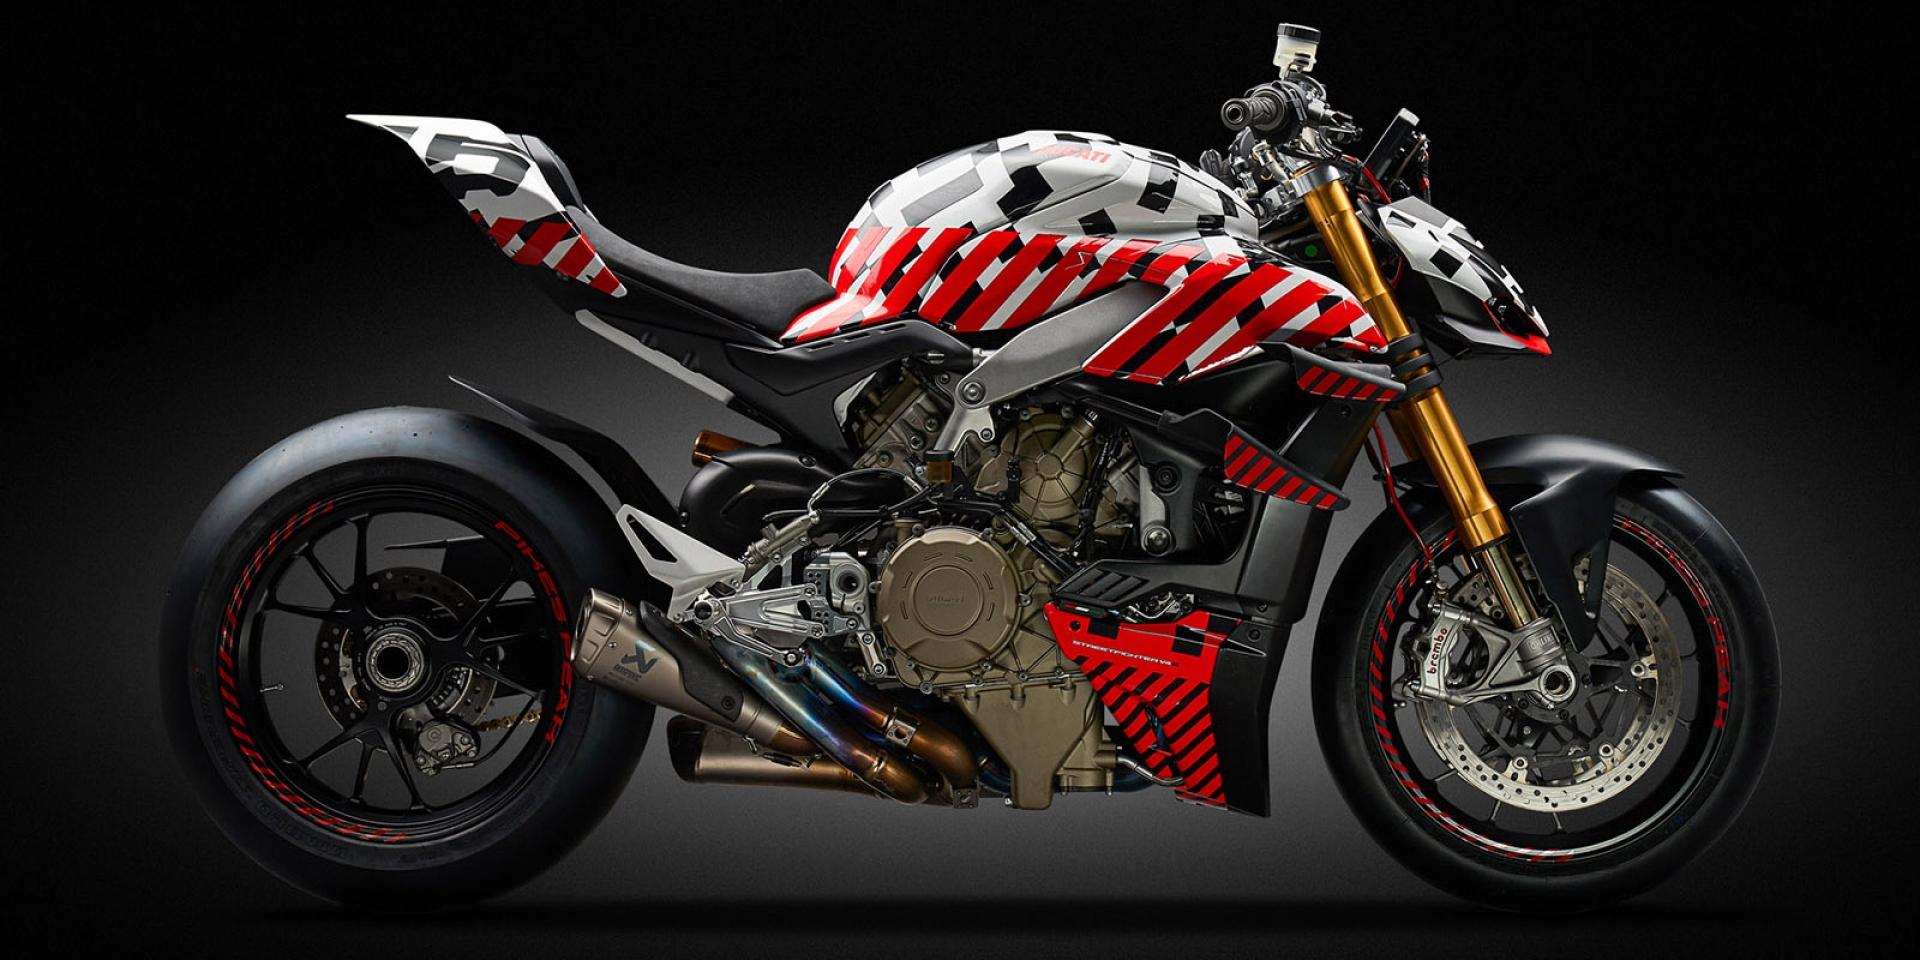 Ducati V4新車決戰派克峰!最快年底正式發表!Streetfighter V4 prototype登場